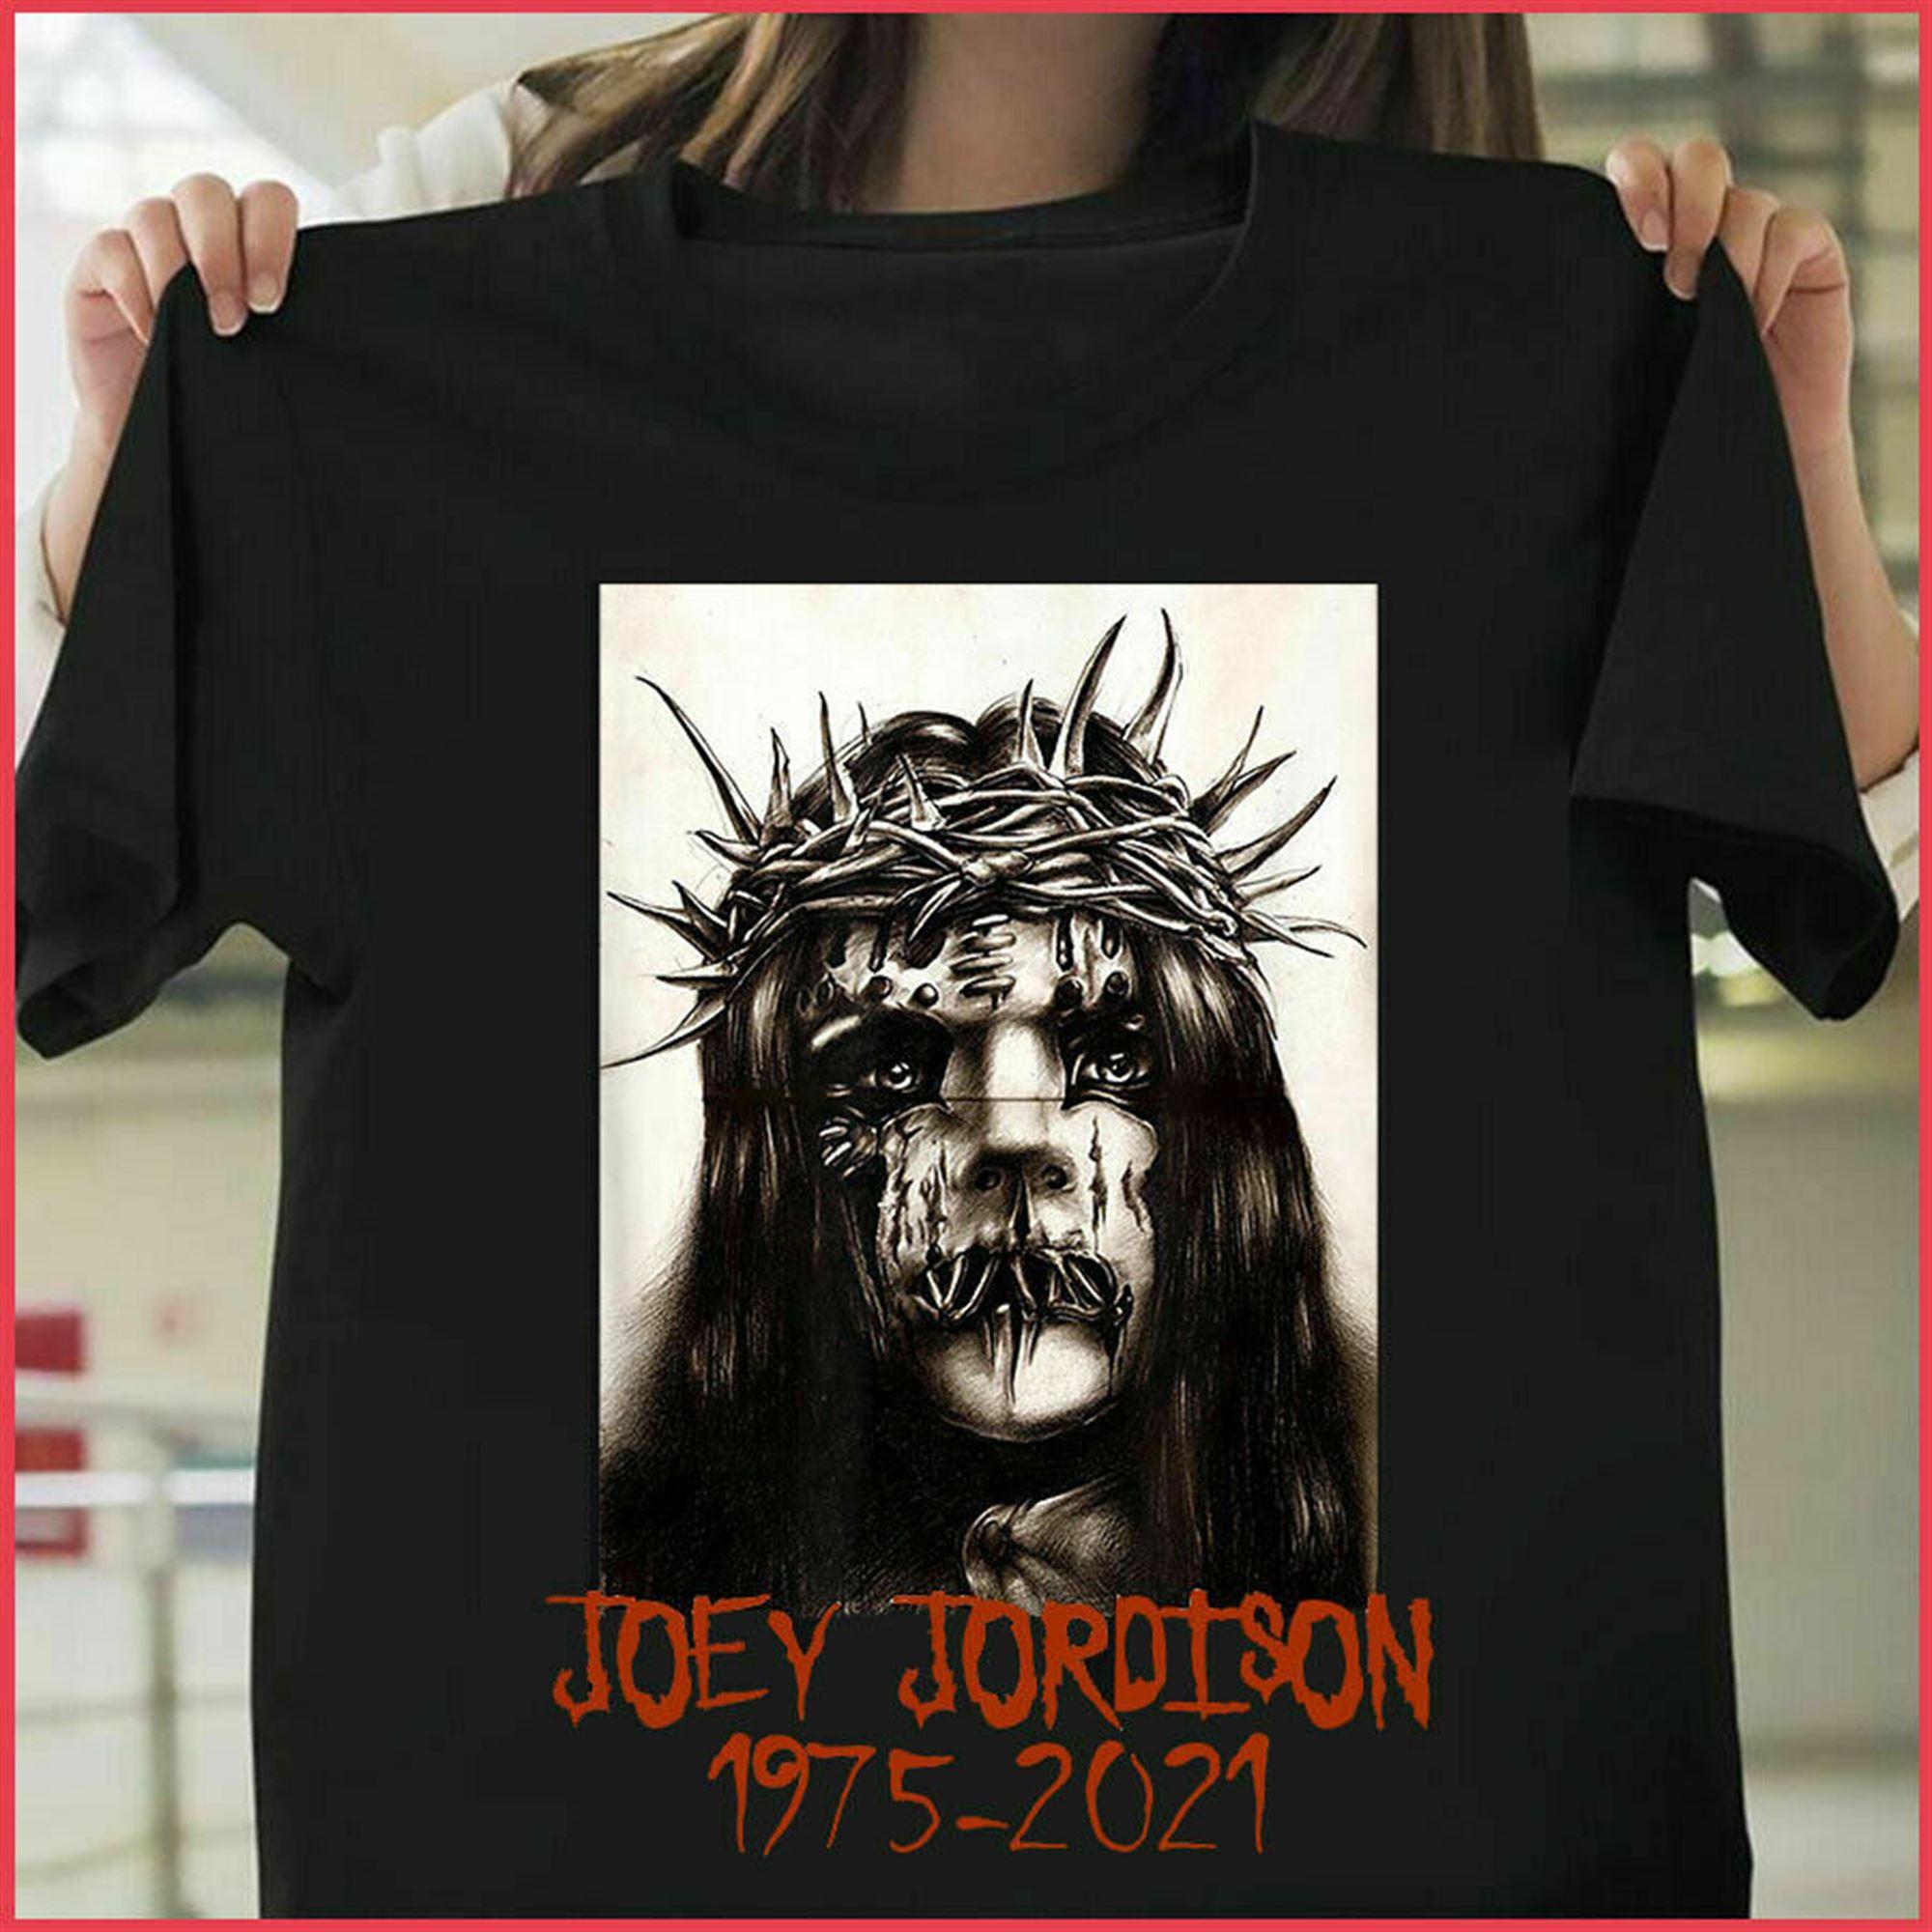 Joey Jordison Slipknot Rip 1975-2021 T-shirt Unisex Size S-5xl